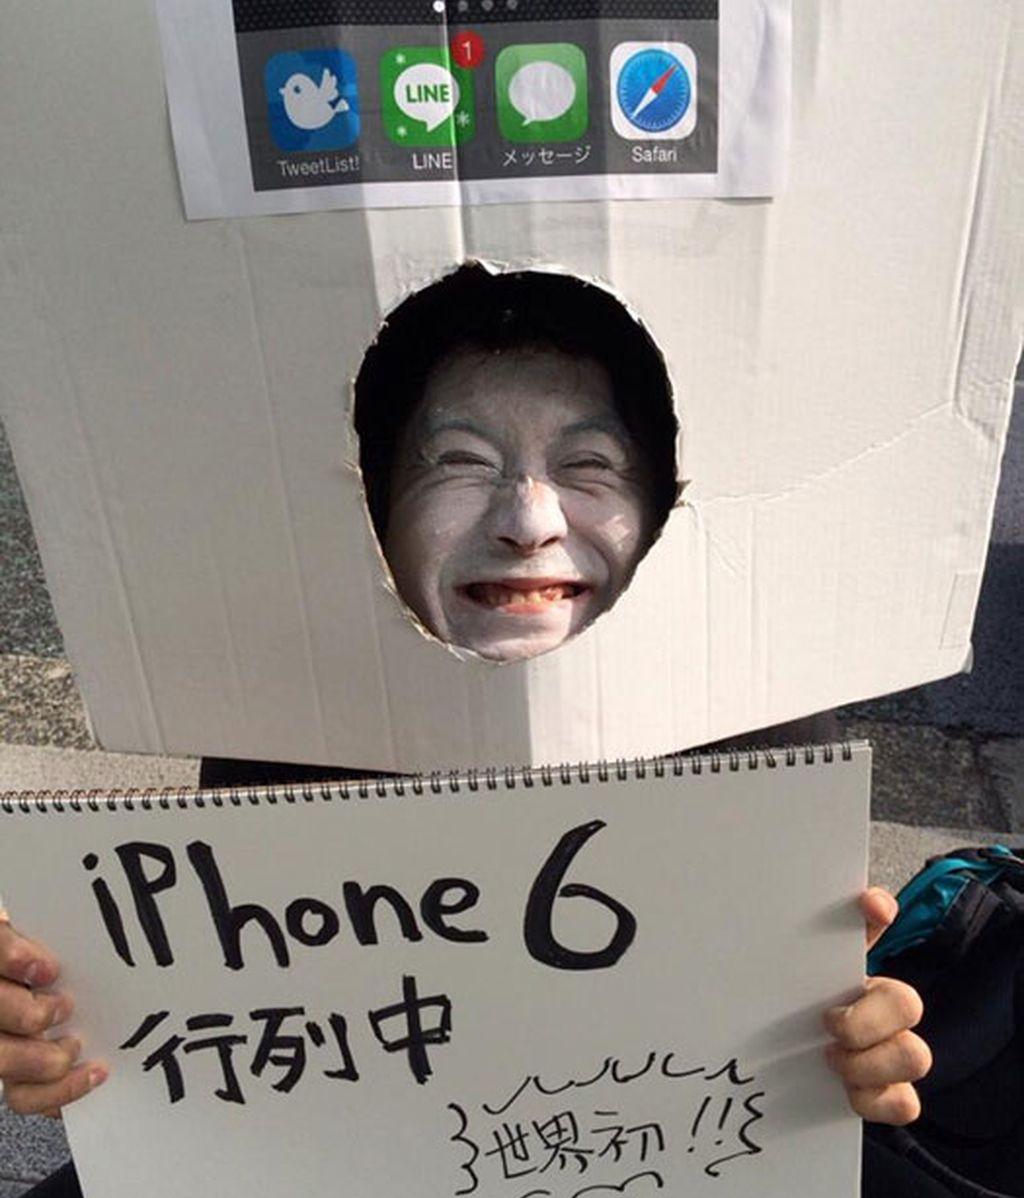 friki, Yoppi, Twitter, iPhone 6